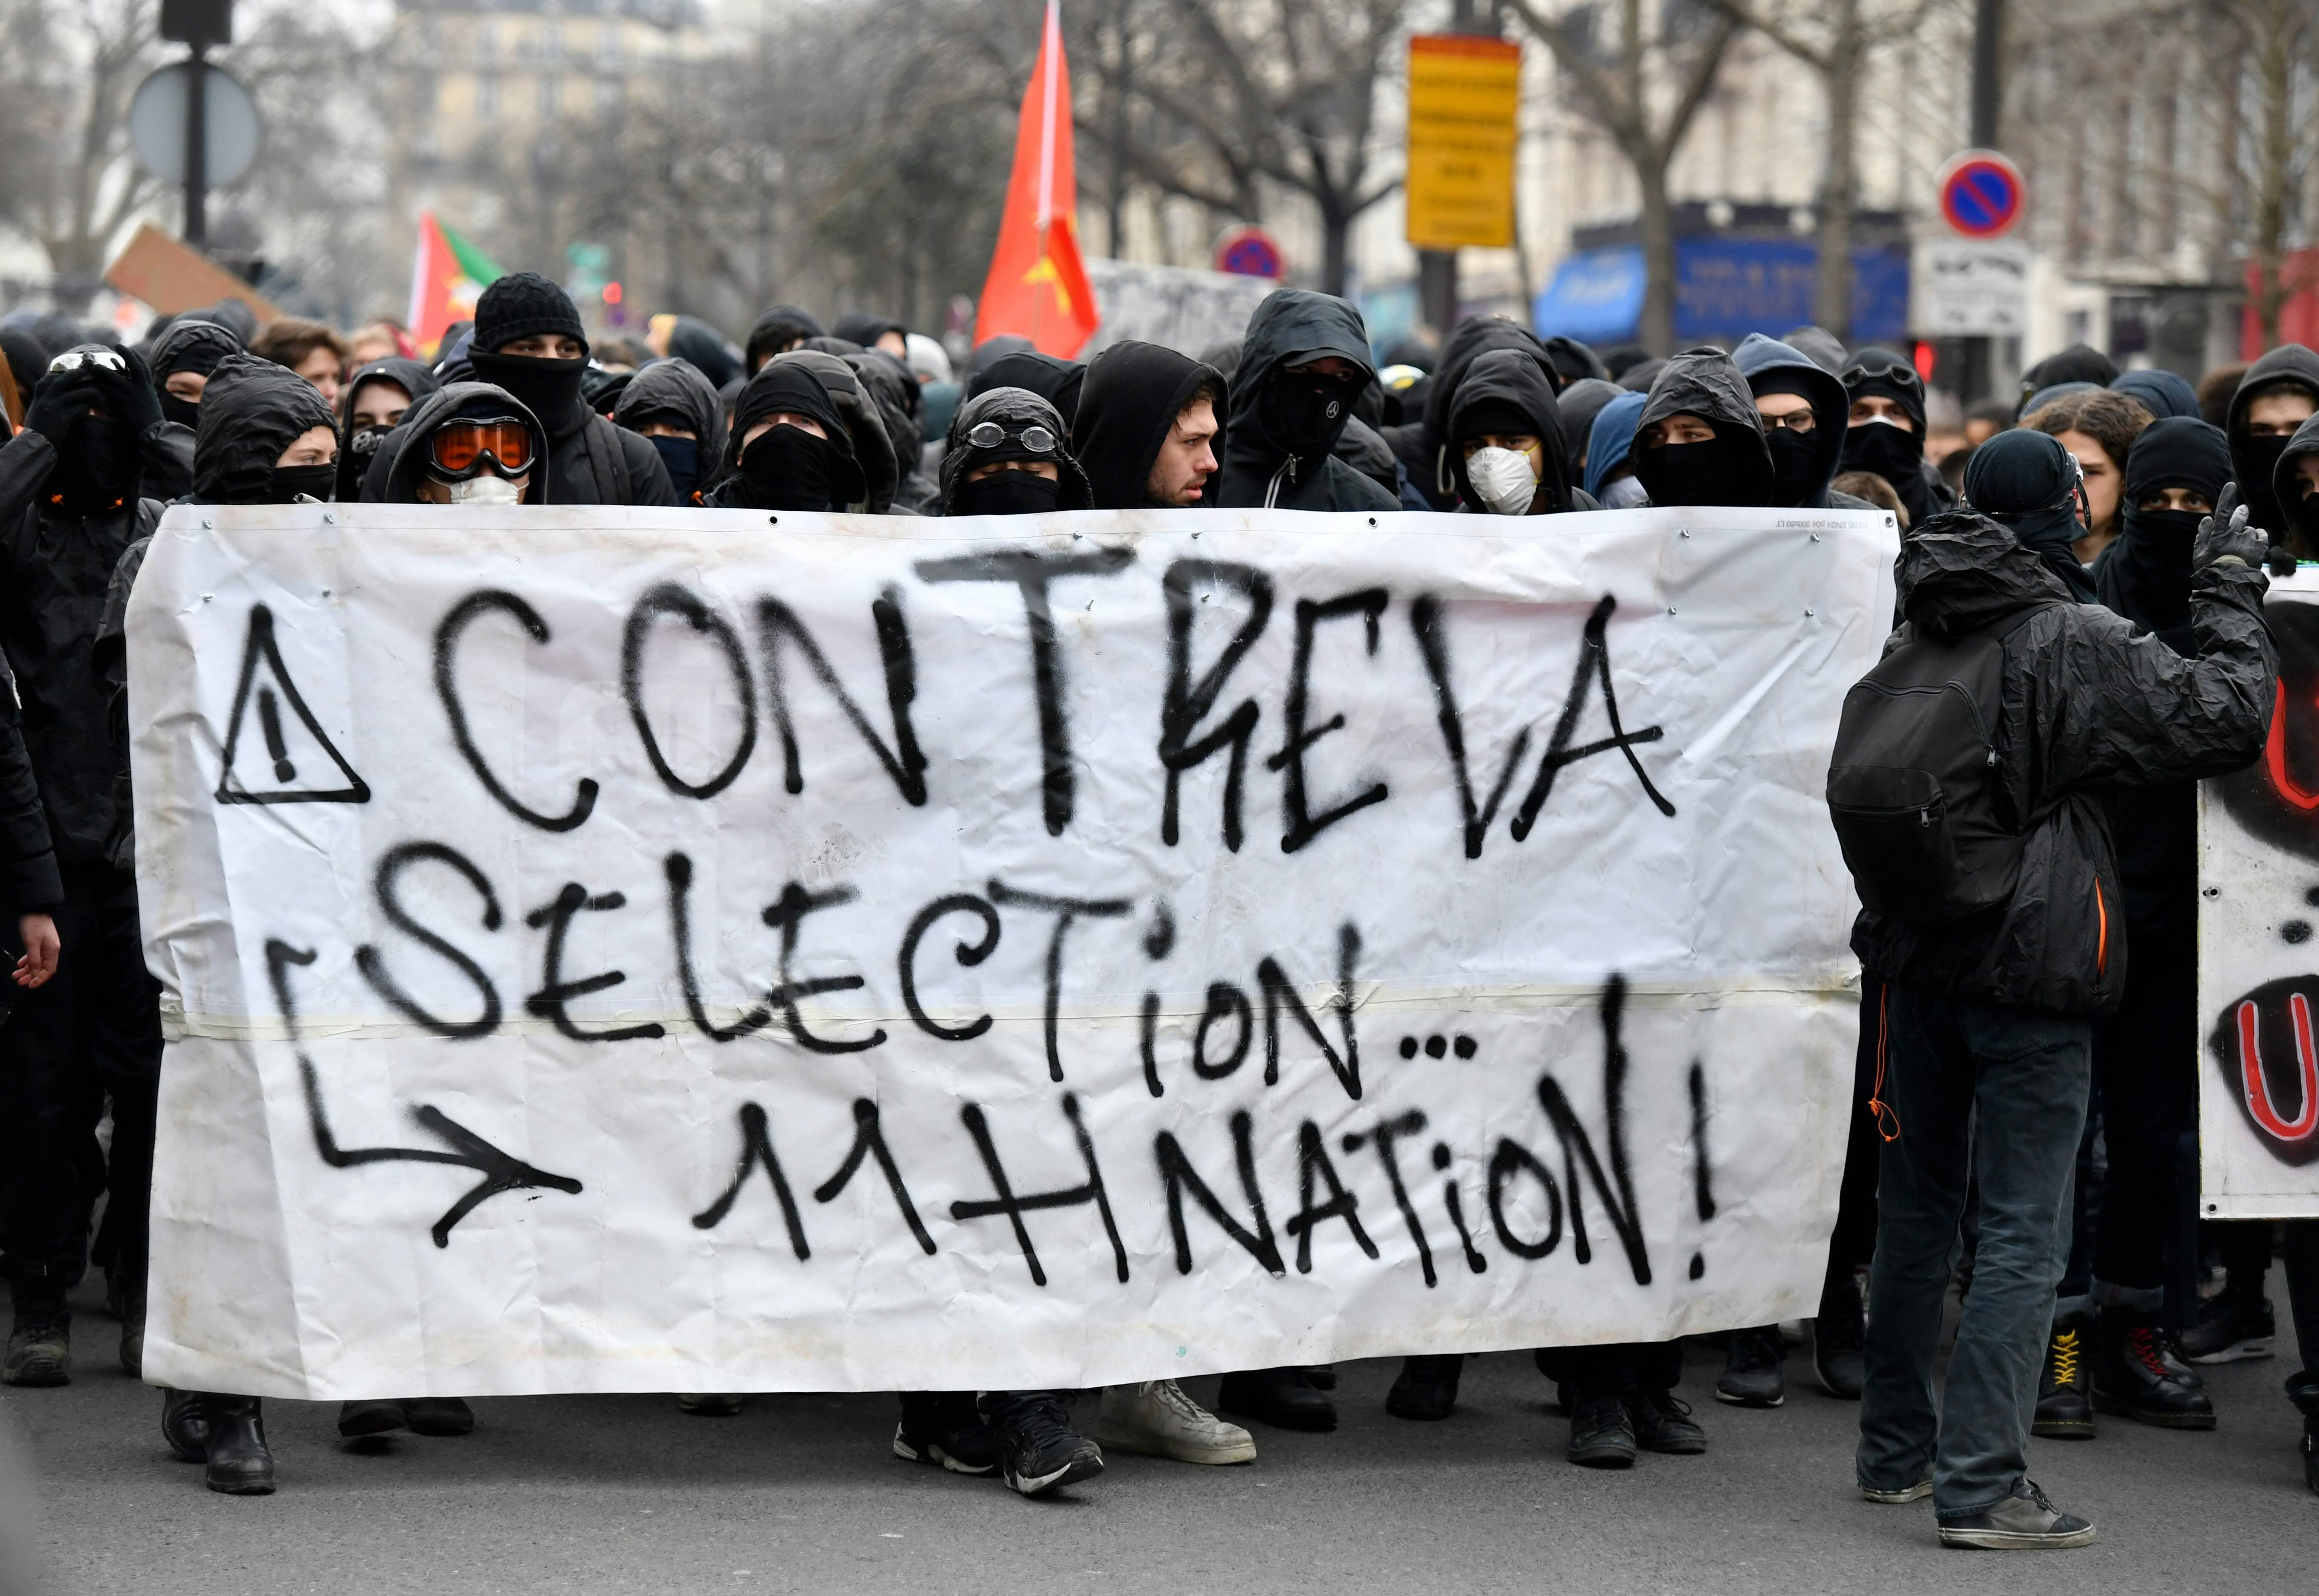 مظاهرات فى فرنسا ضد اصلاحات ماكرون